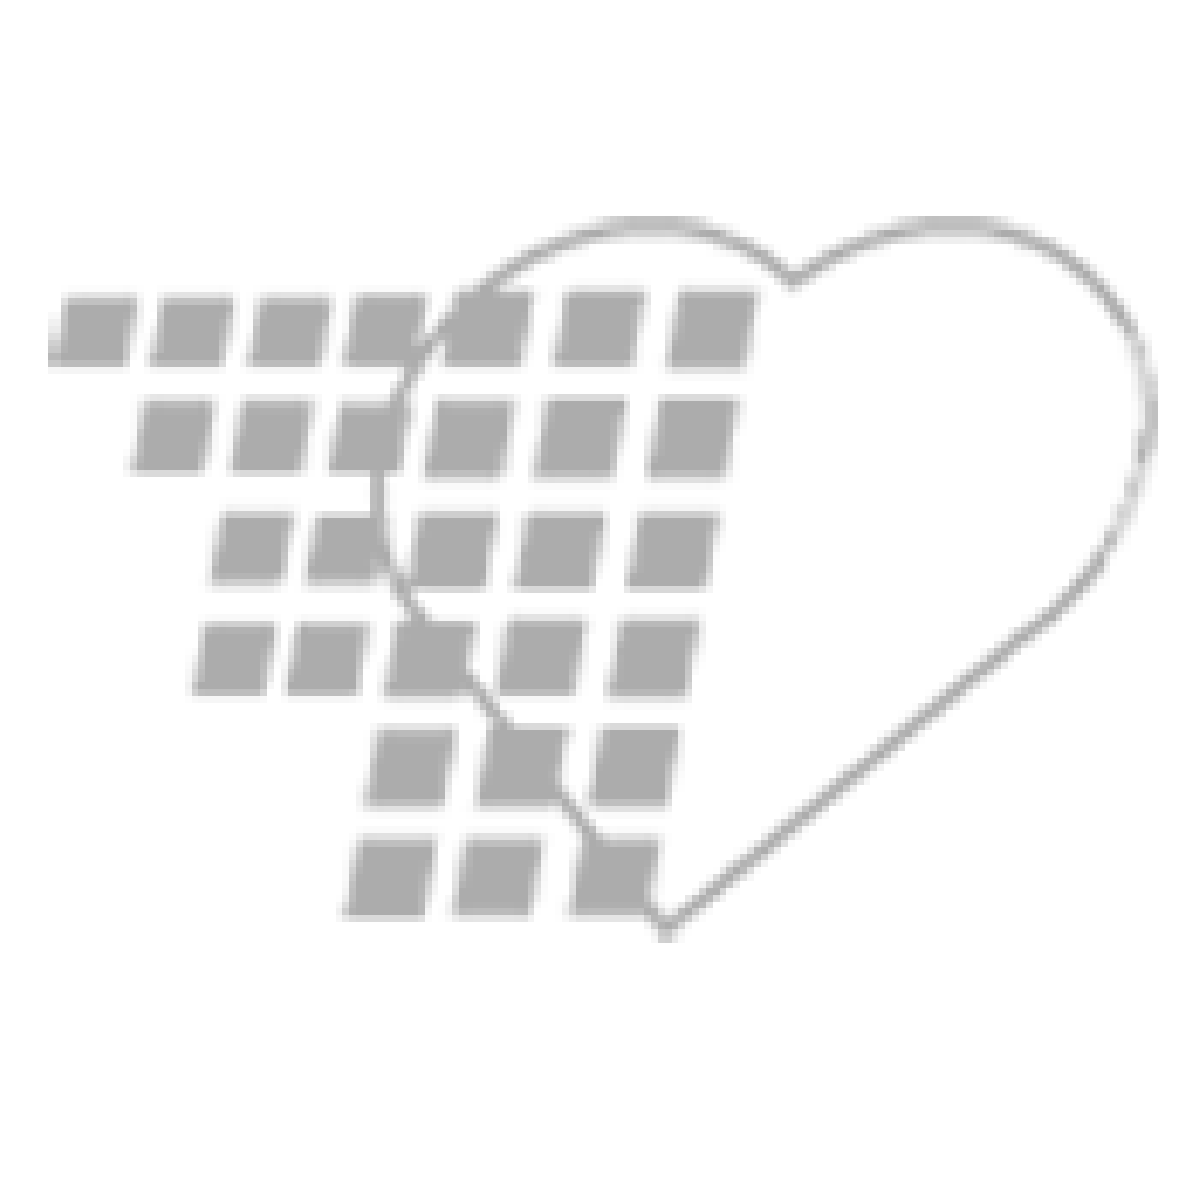 06-93-0418 - Demo Dose® Znc 10 mL